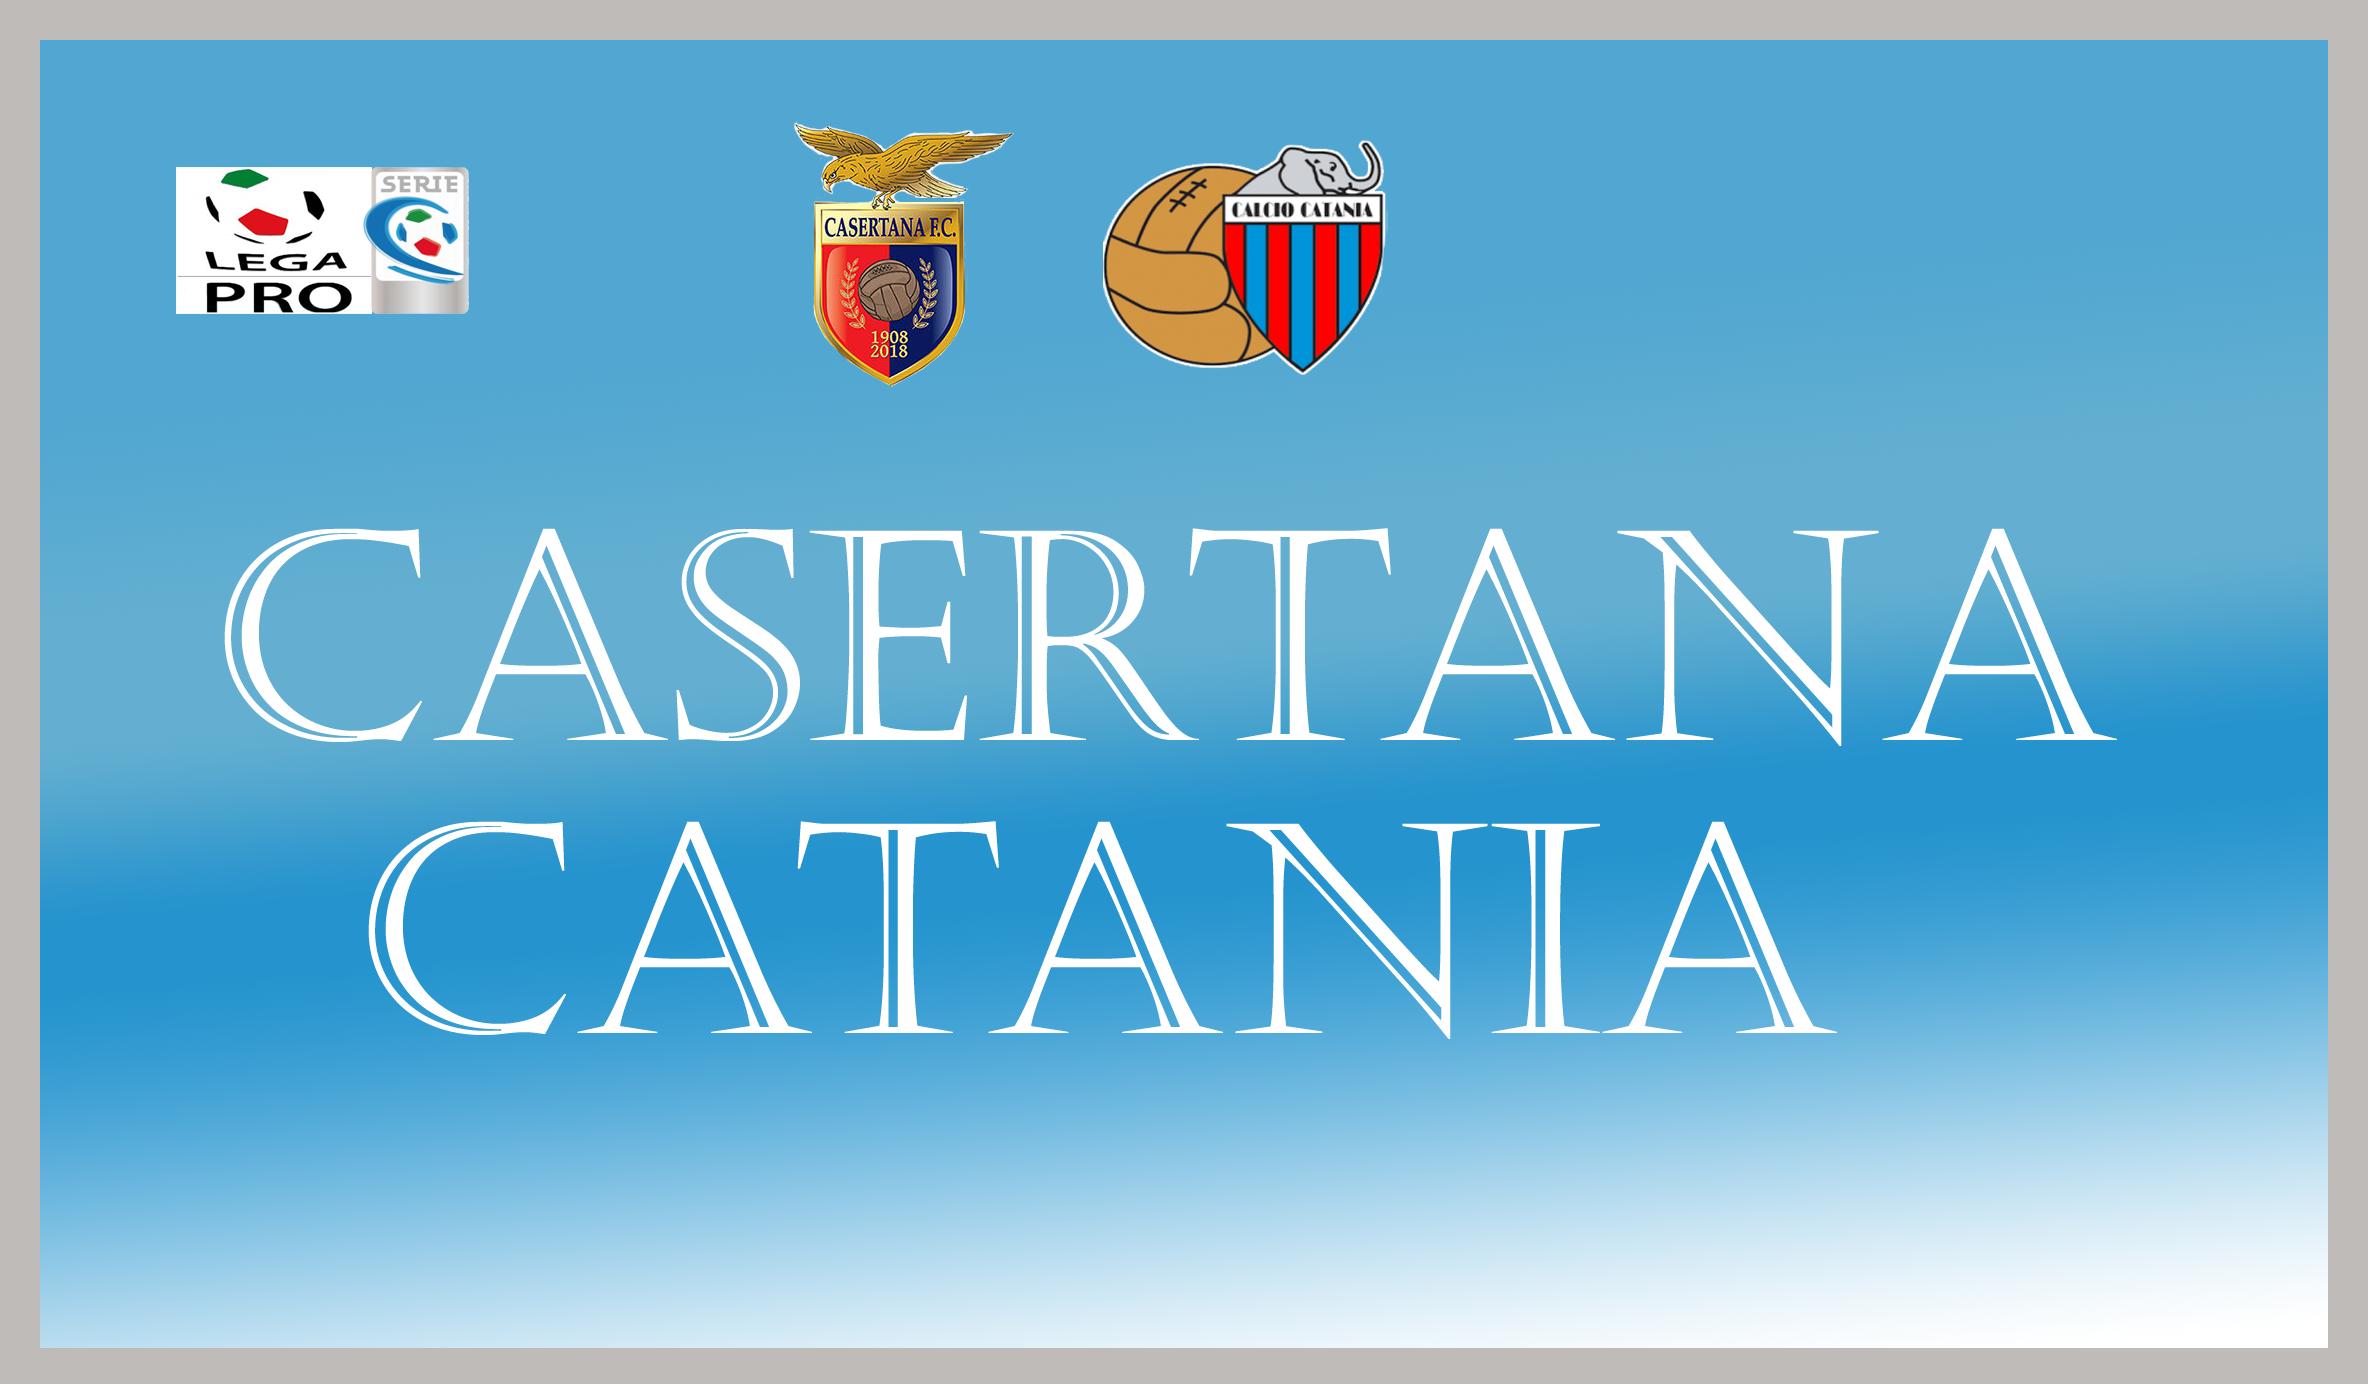 06.Casertana-Catania